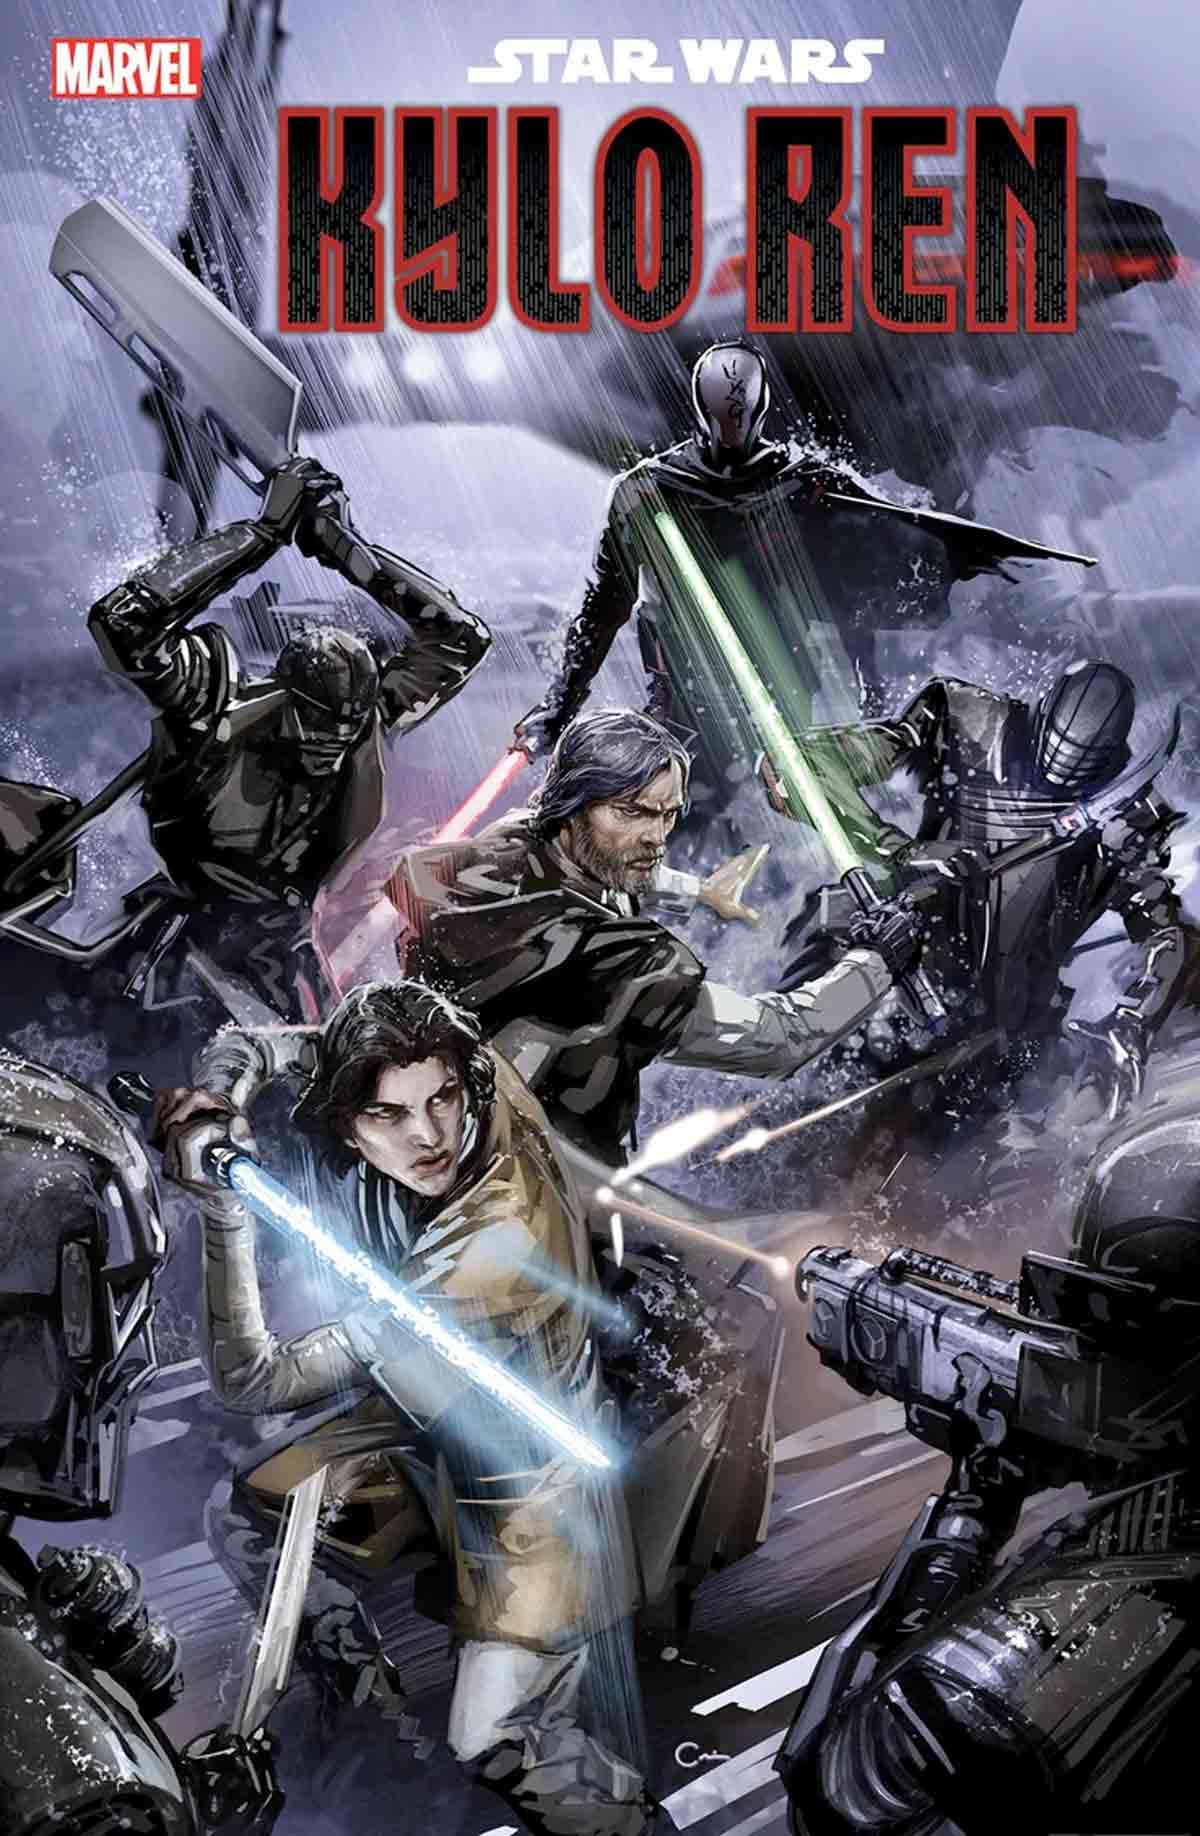 Luke Skywalker y Kylo Ren se enfrentaron a los Caballeros de Ren